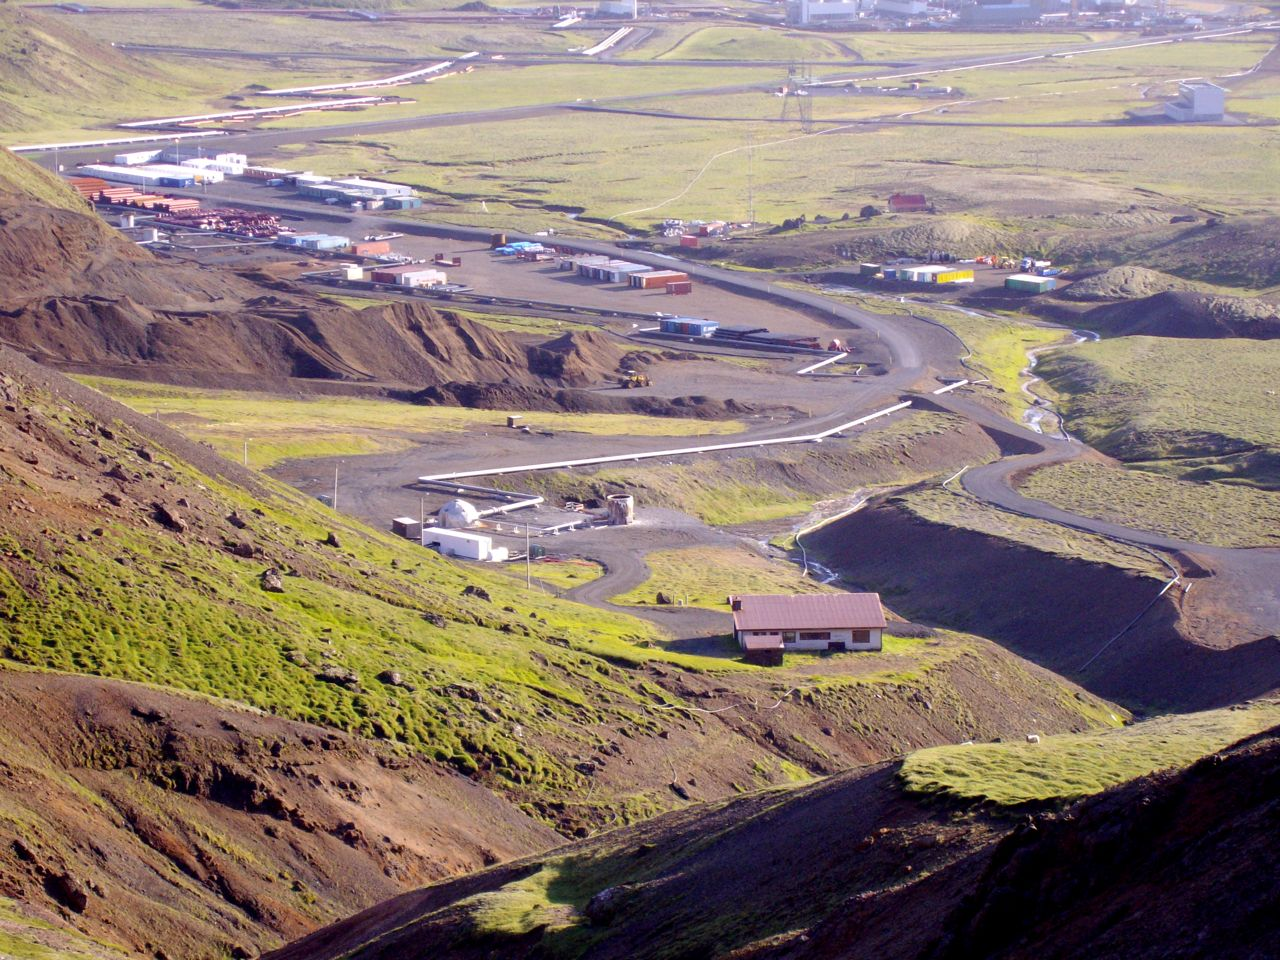 Drilling at Skardsmyrarfjall - Saving Iceland's photo from 2008